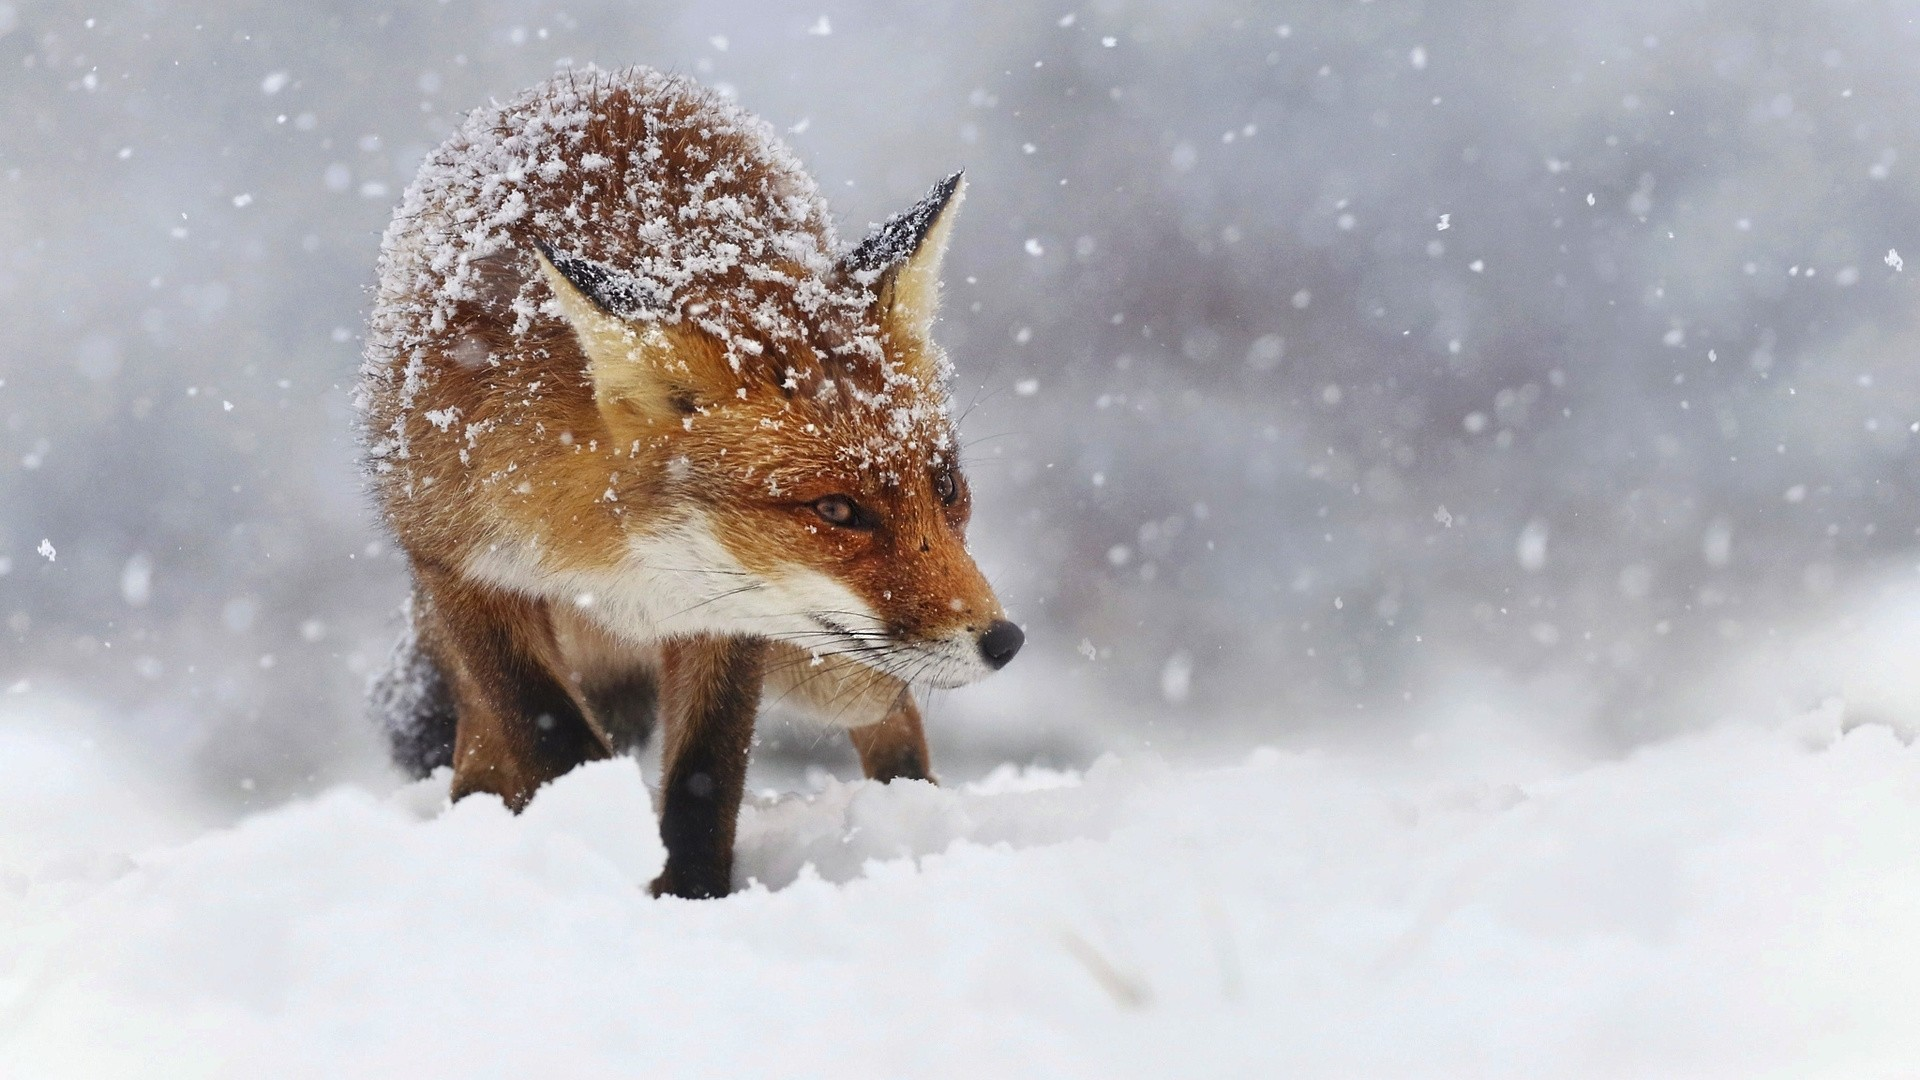 Winter Fox HD Wallpaper